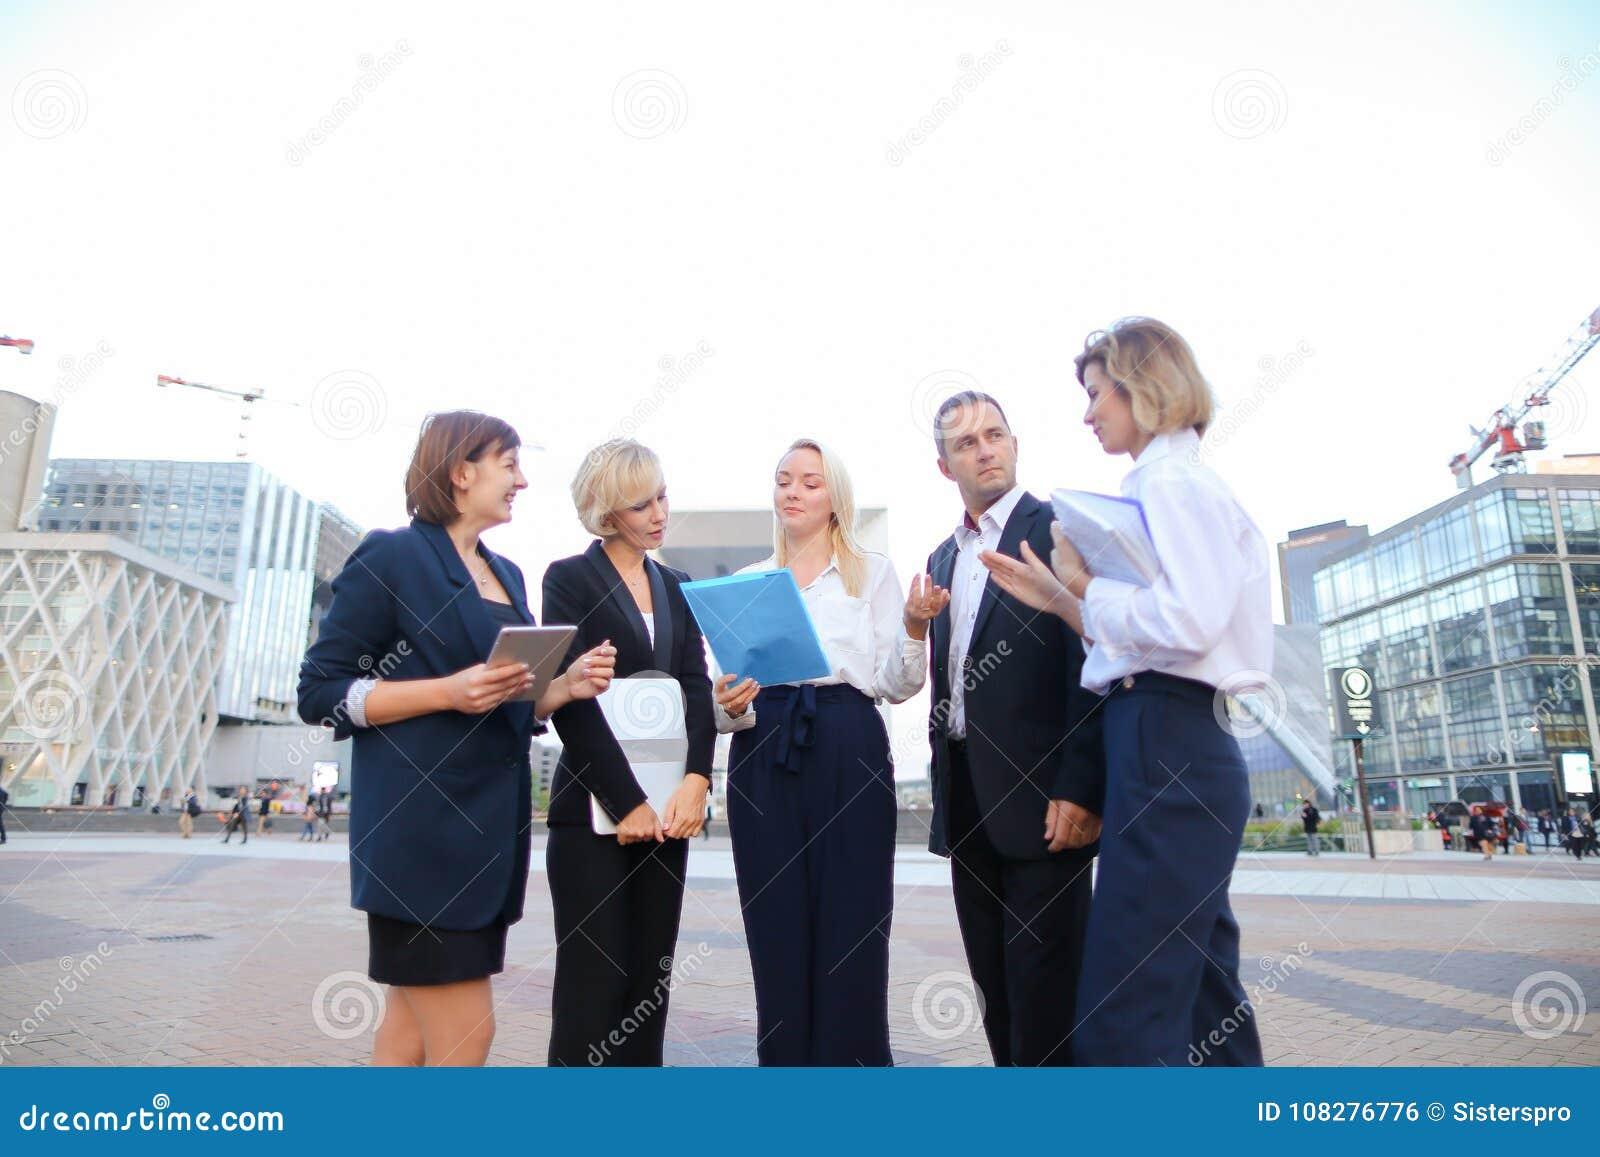 Бизнес партнеры бизнес идея бизнес план бесплатного кафе